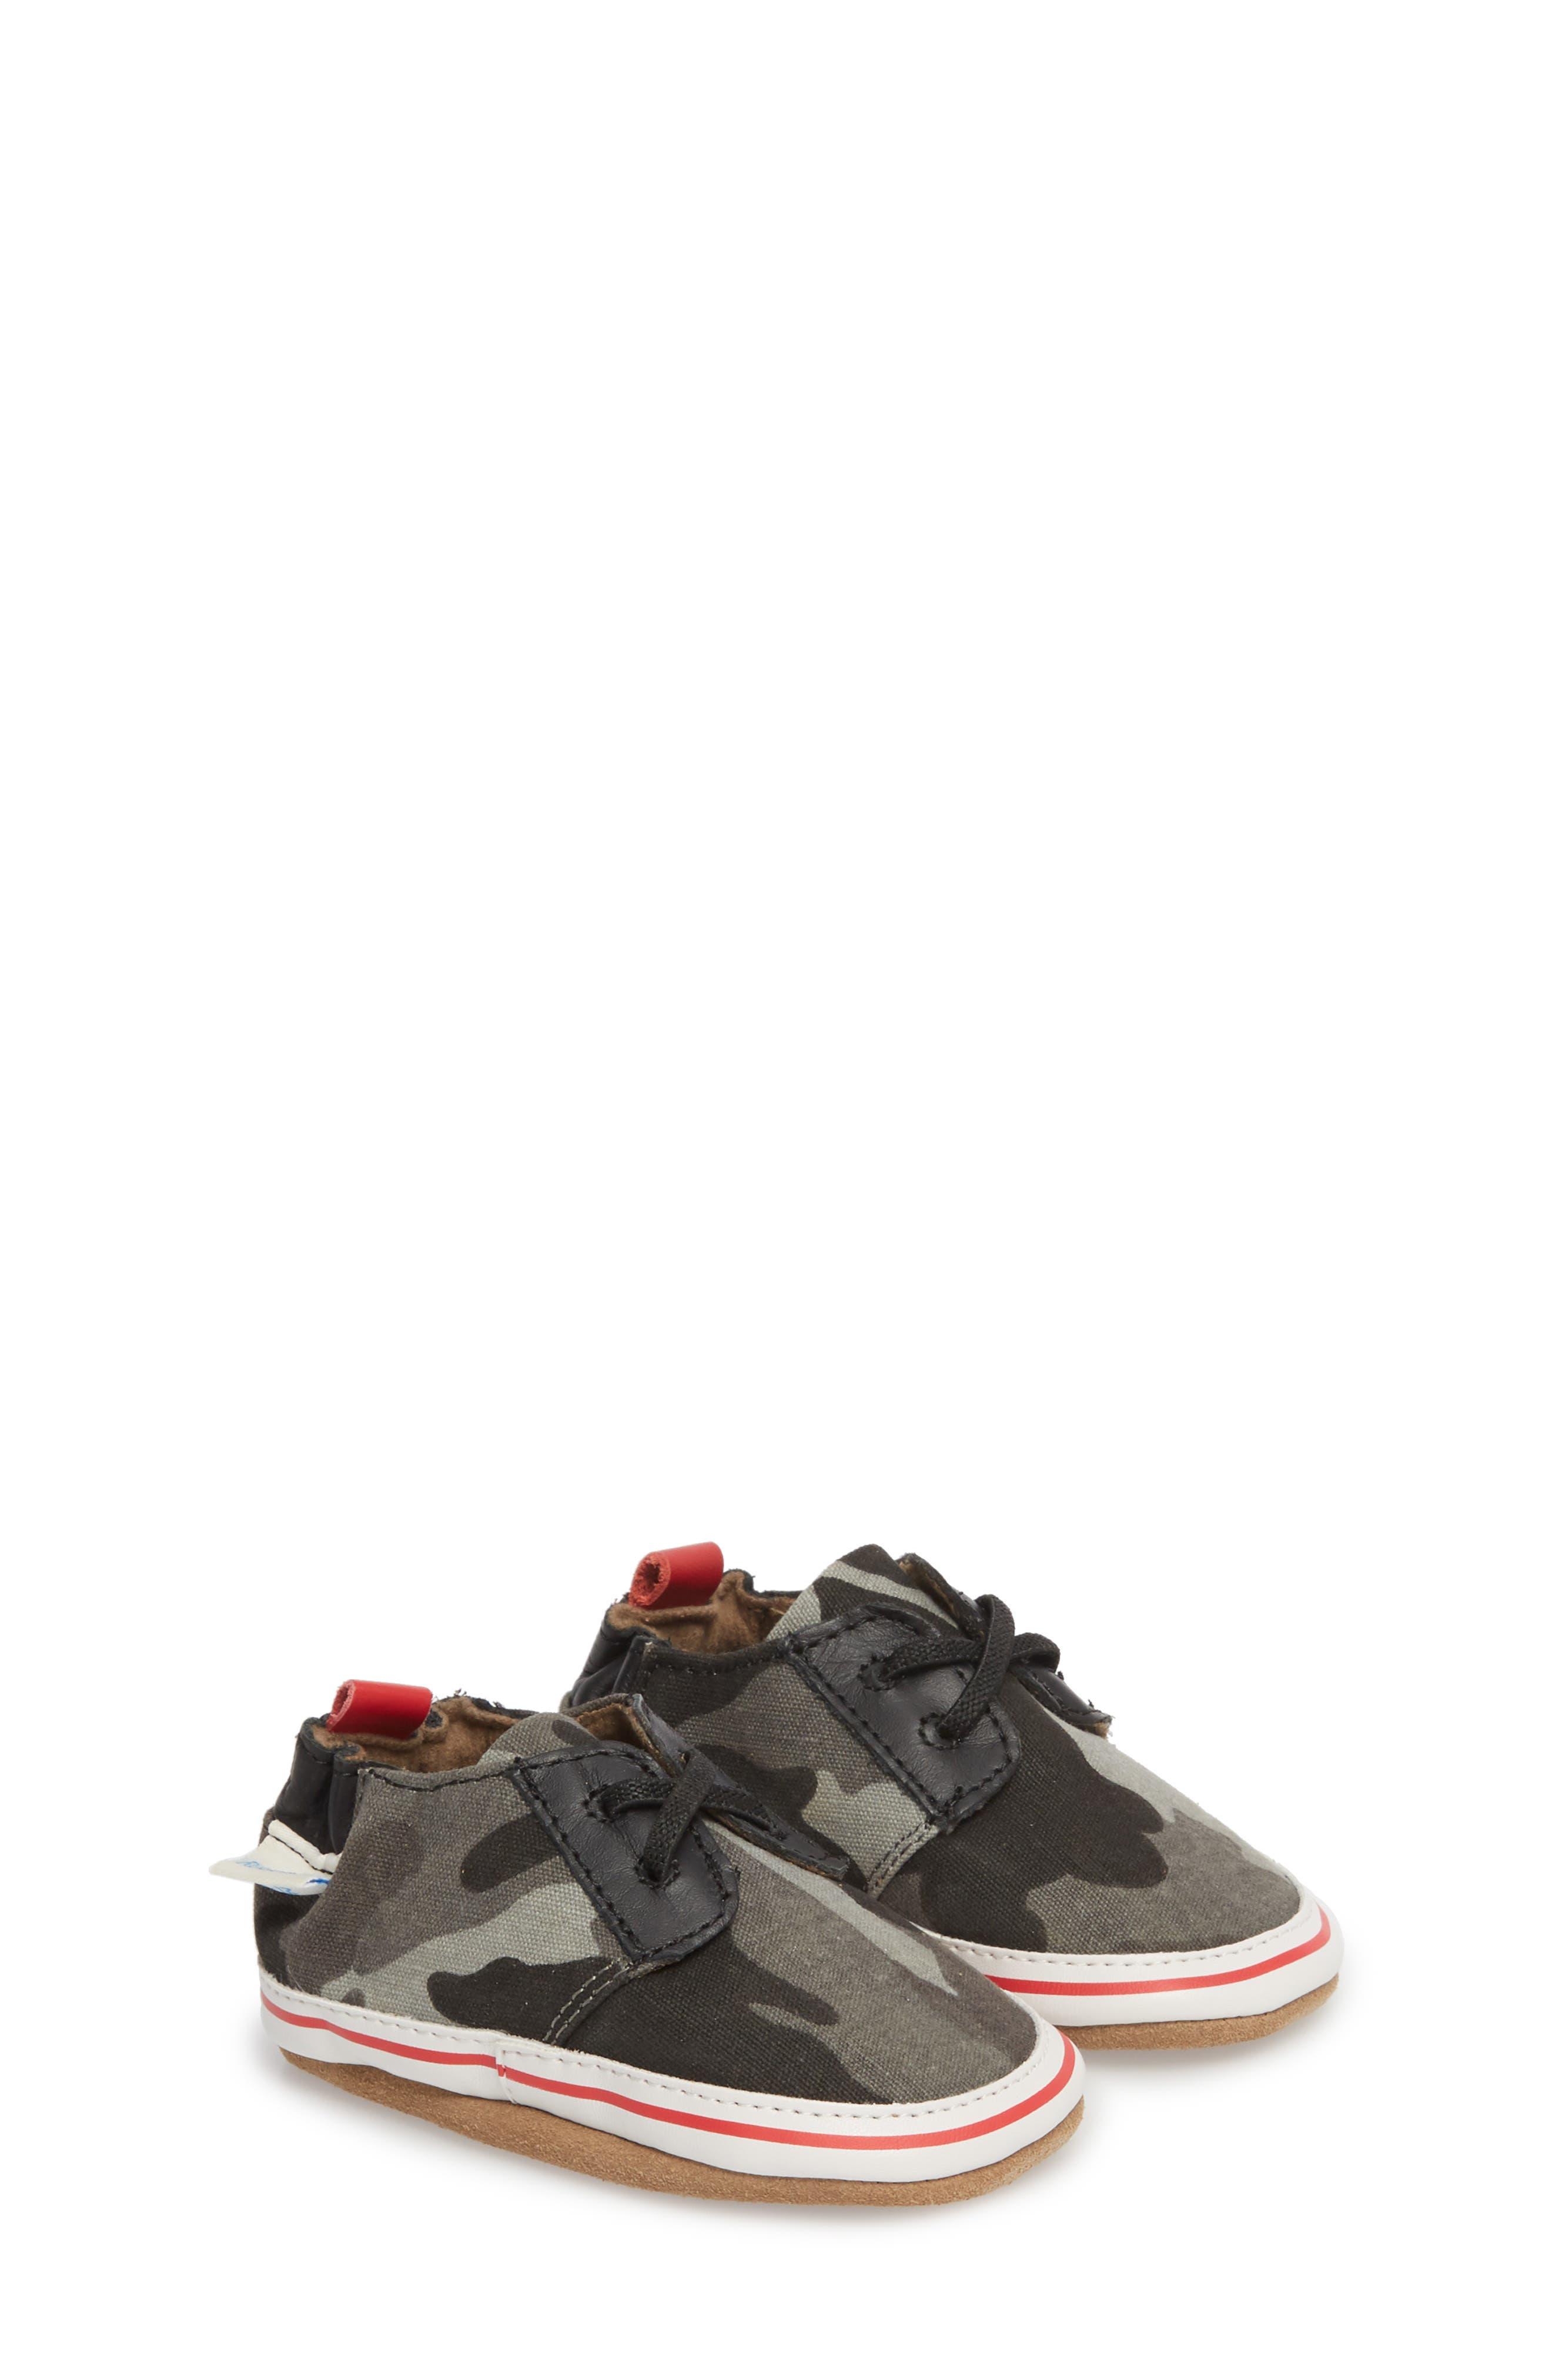 Cool & Casual Camo Print Crib Shoe,                         Main,                         color, 020